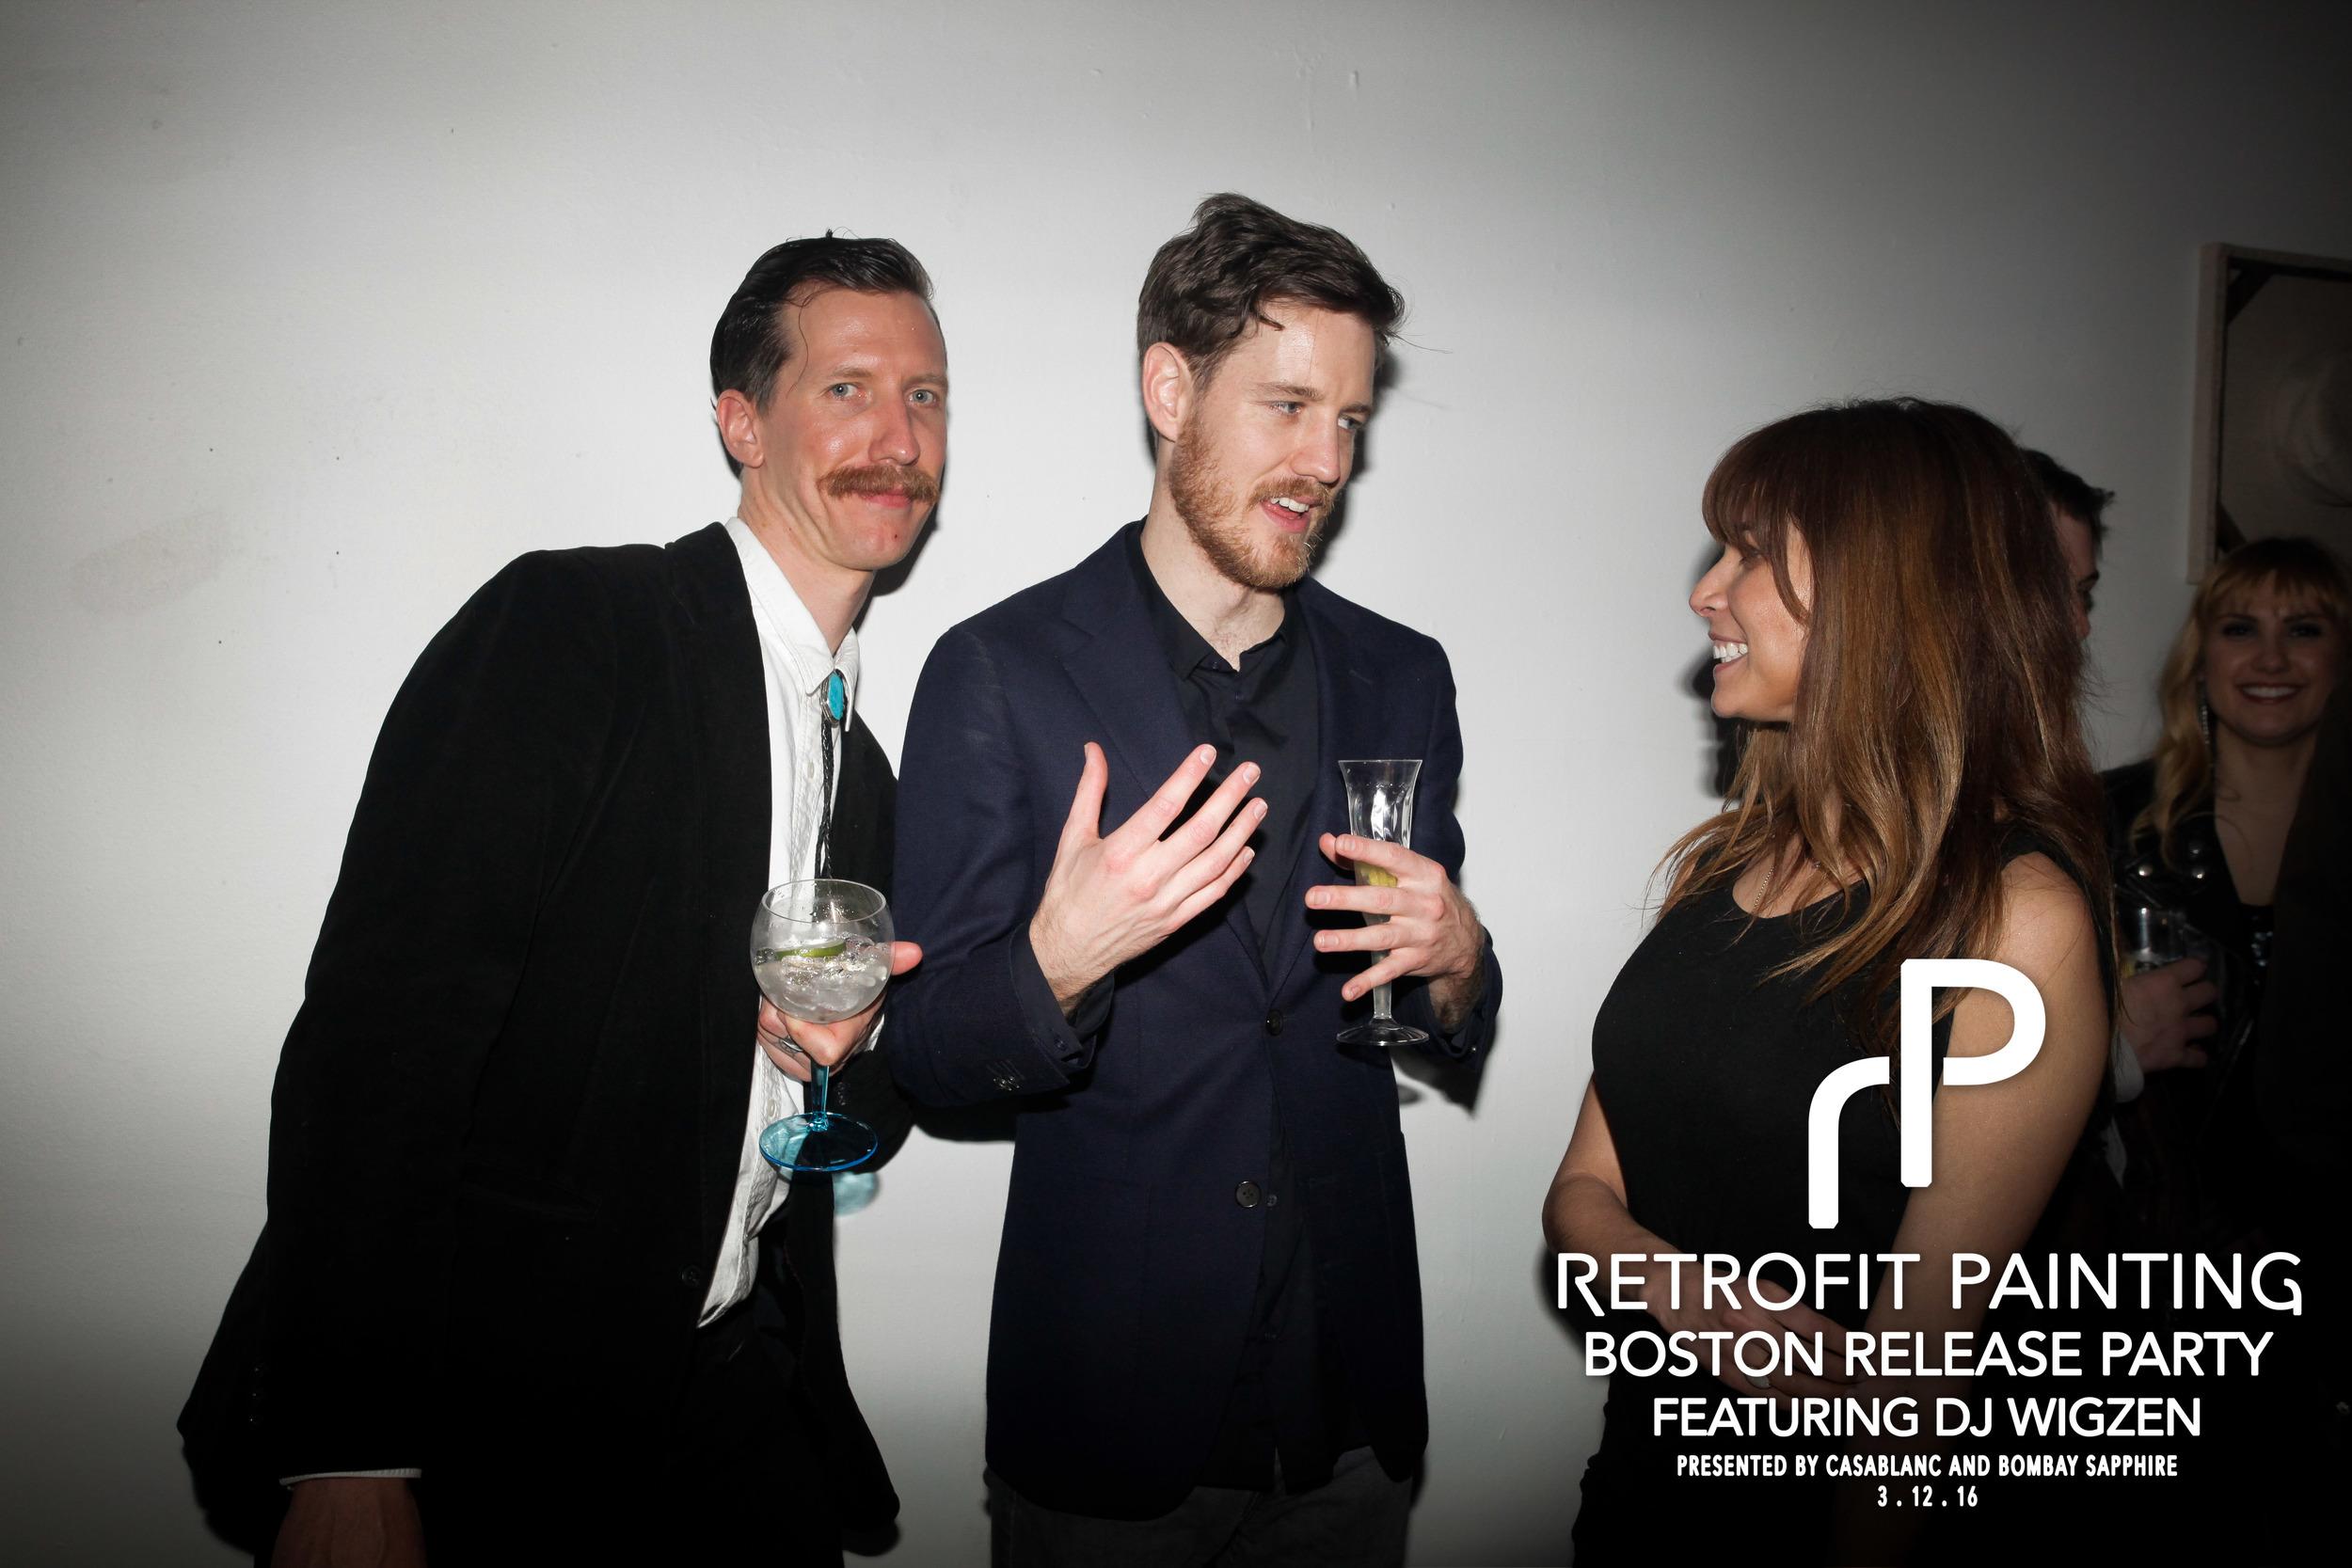 Retrofit Painting Boston Release Party 0119.jpg